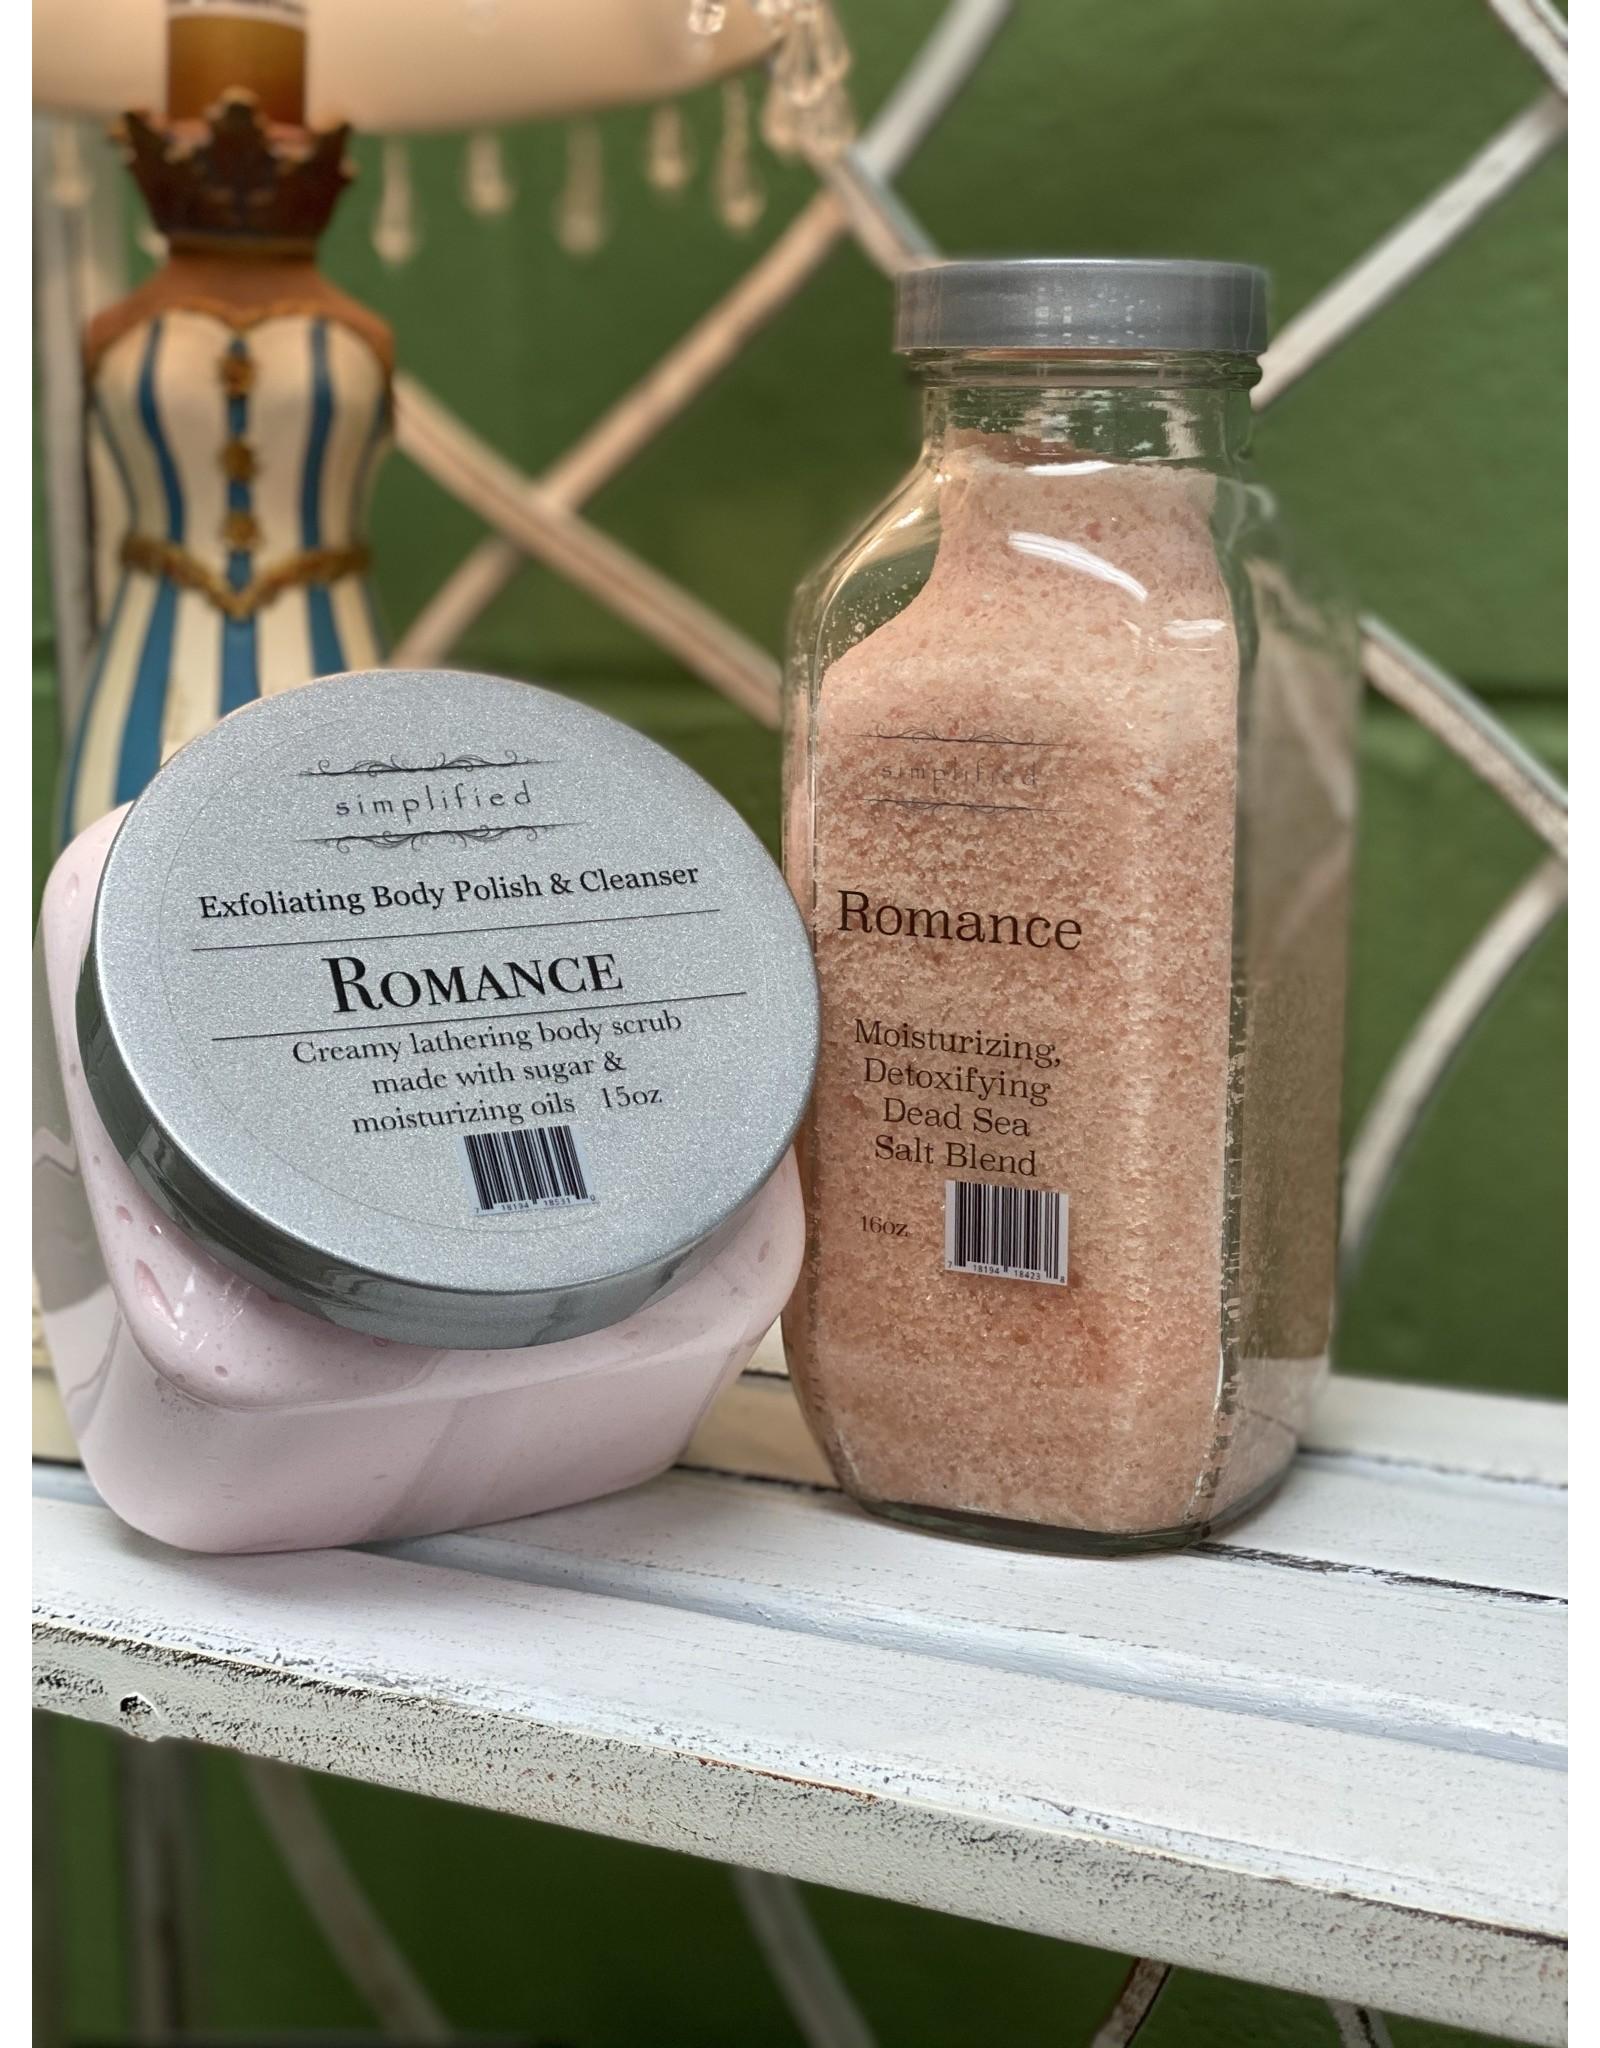 Romance Dead Sea Salt Blend